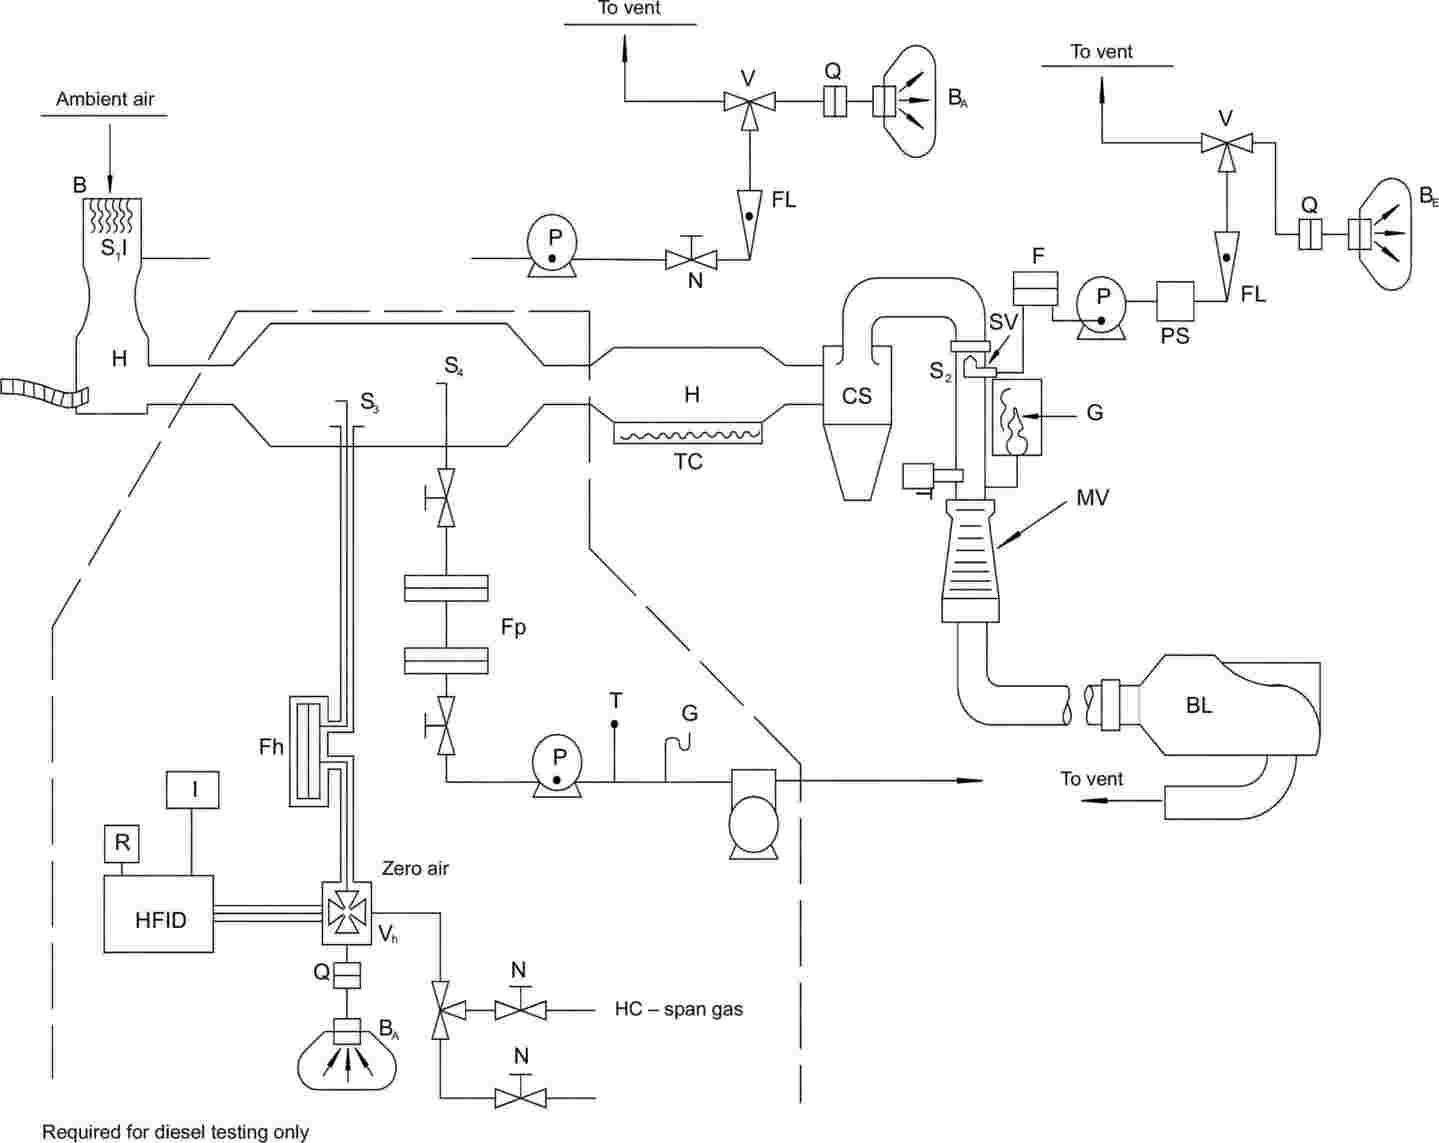 Eur Lex 42006x122706r01 En Piping Layout Engineer Interview Engine Schematic Image